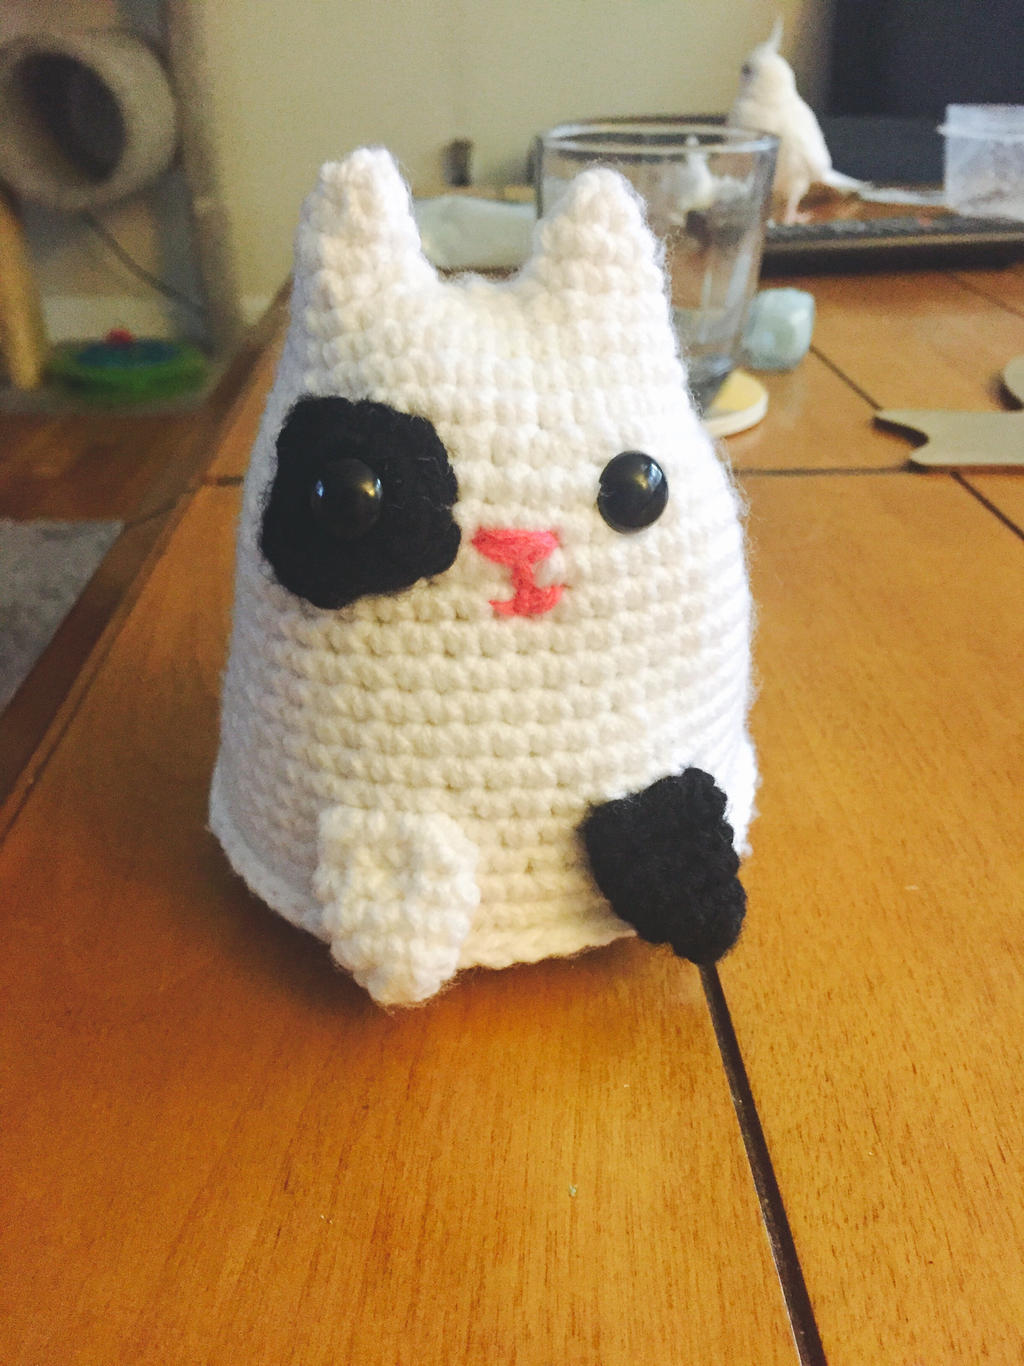 Pansexual Pride Crochet Dumpling Cat – Stitchy Frood | 1366x1024